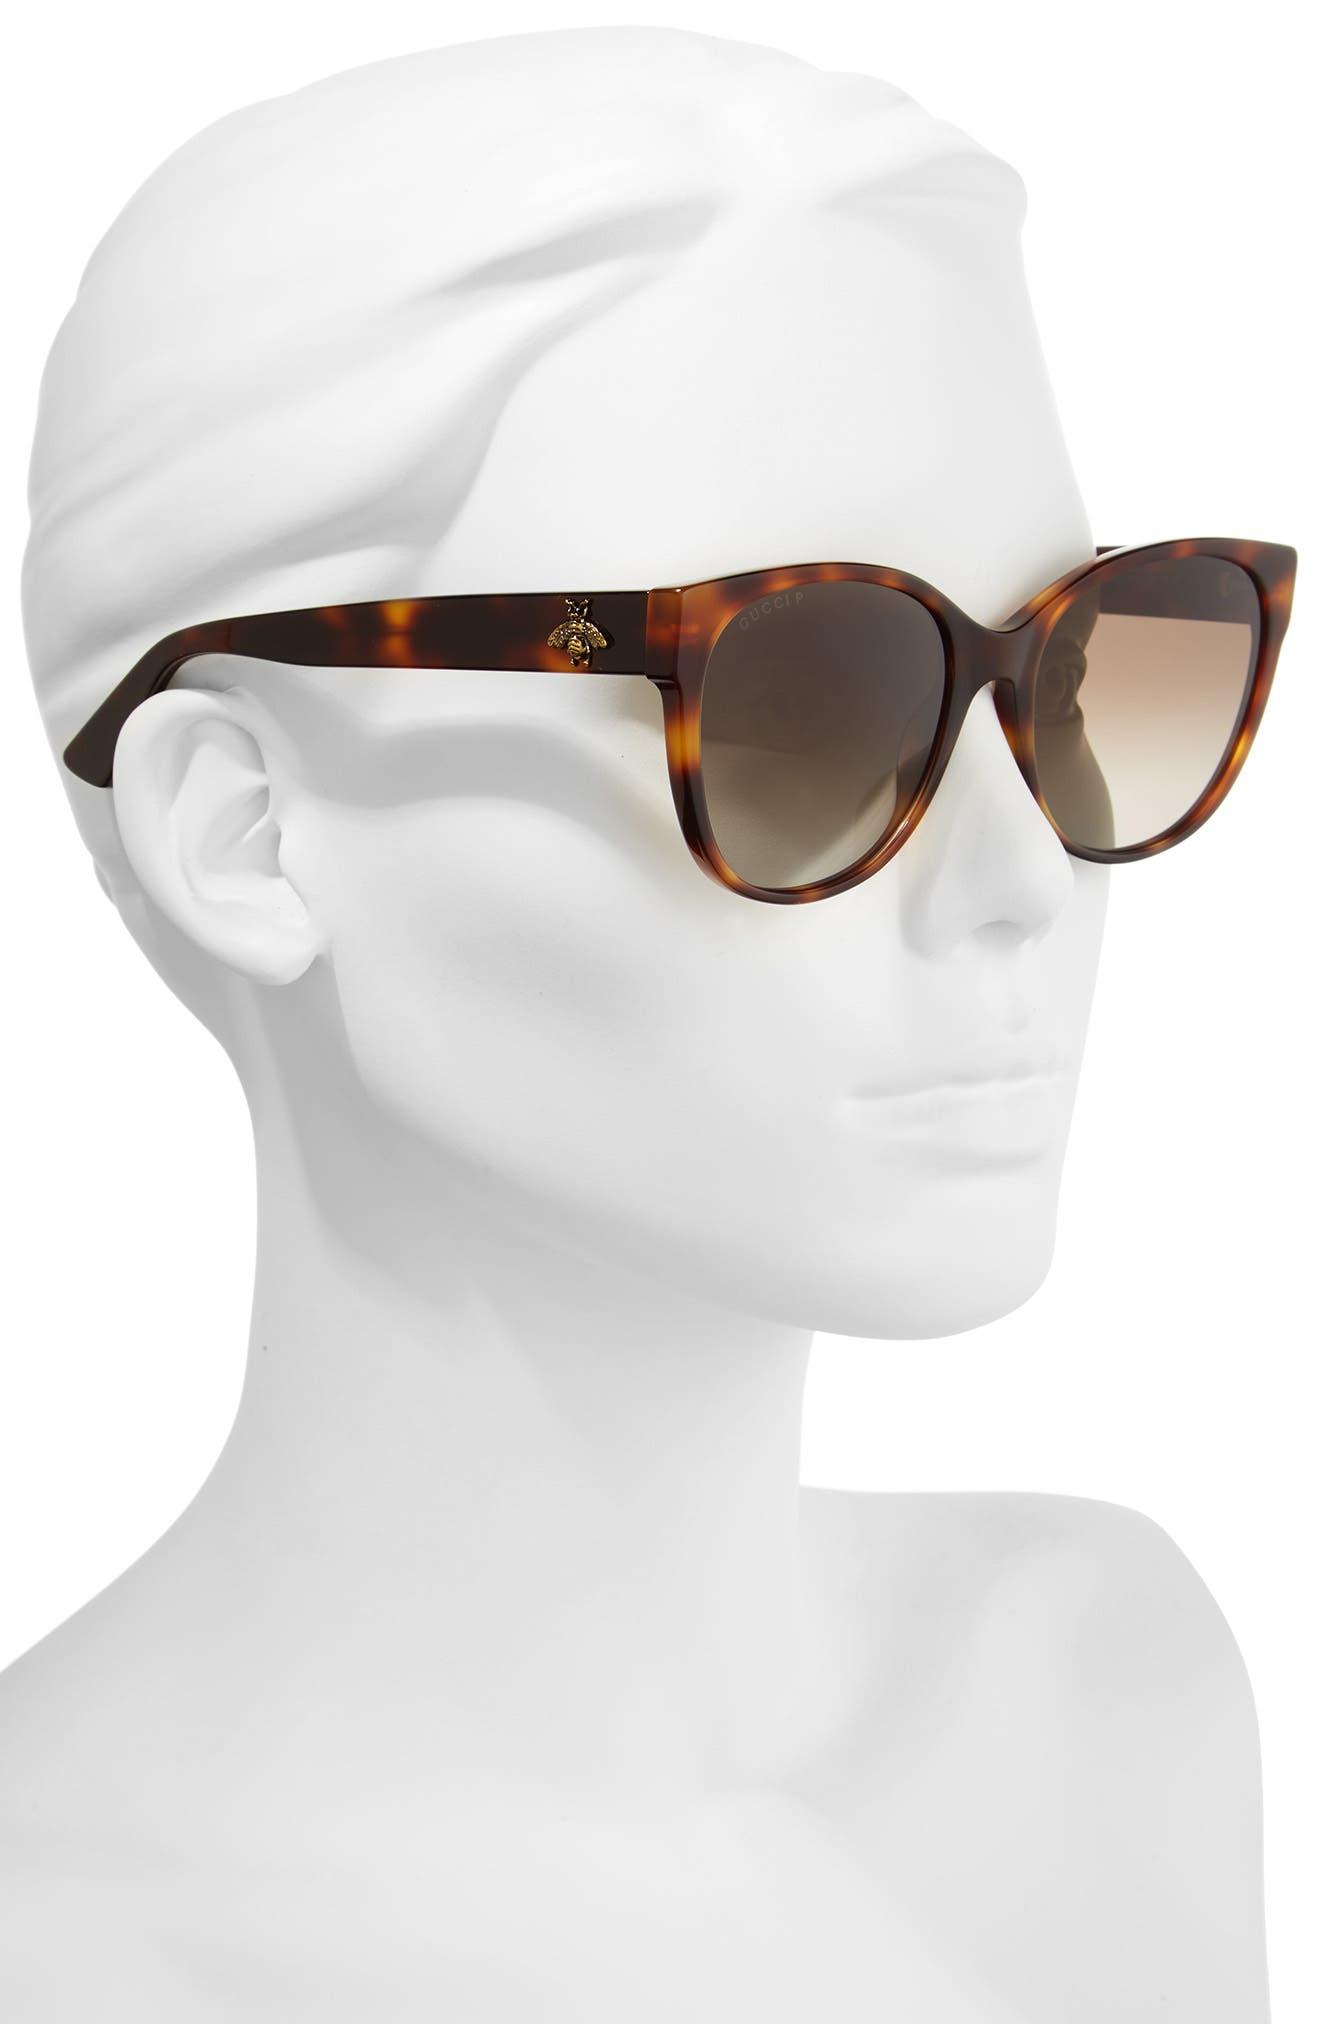 56mm Polarized Cat Eye Sunglasses,                             Alternate thumbnail 2, color,                             Havana/ Brown